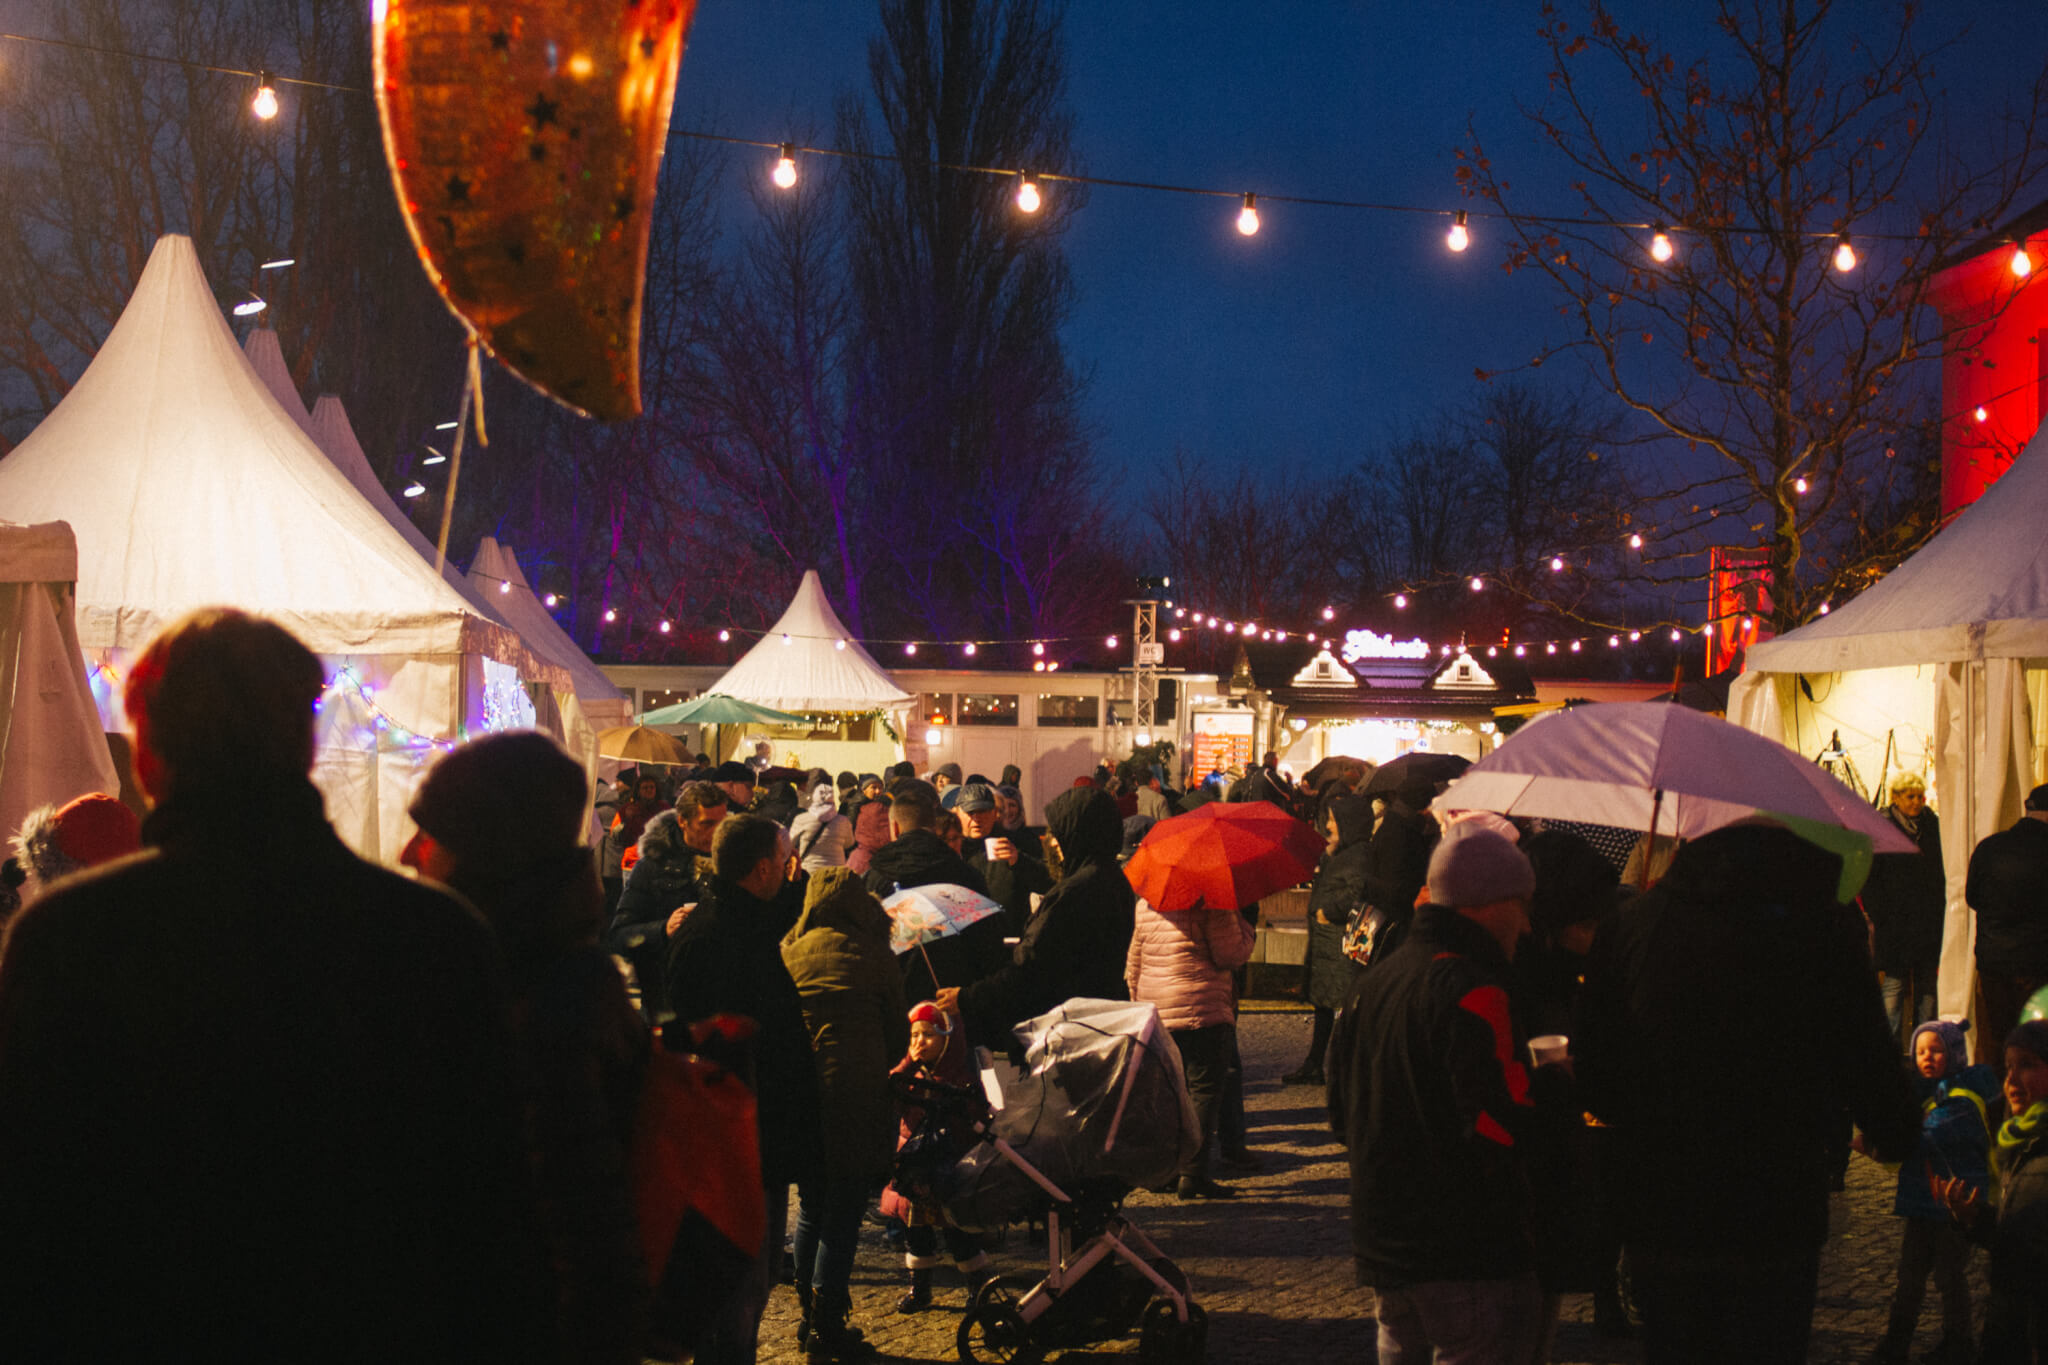 weihnachtsmarkt-in-ludwigsfelde-klubhaushof-5997